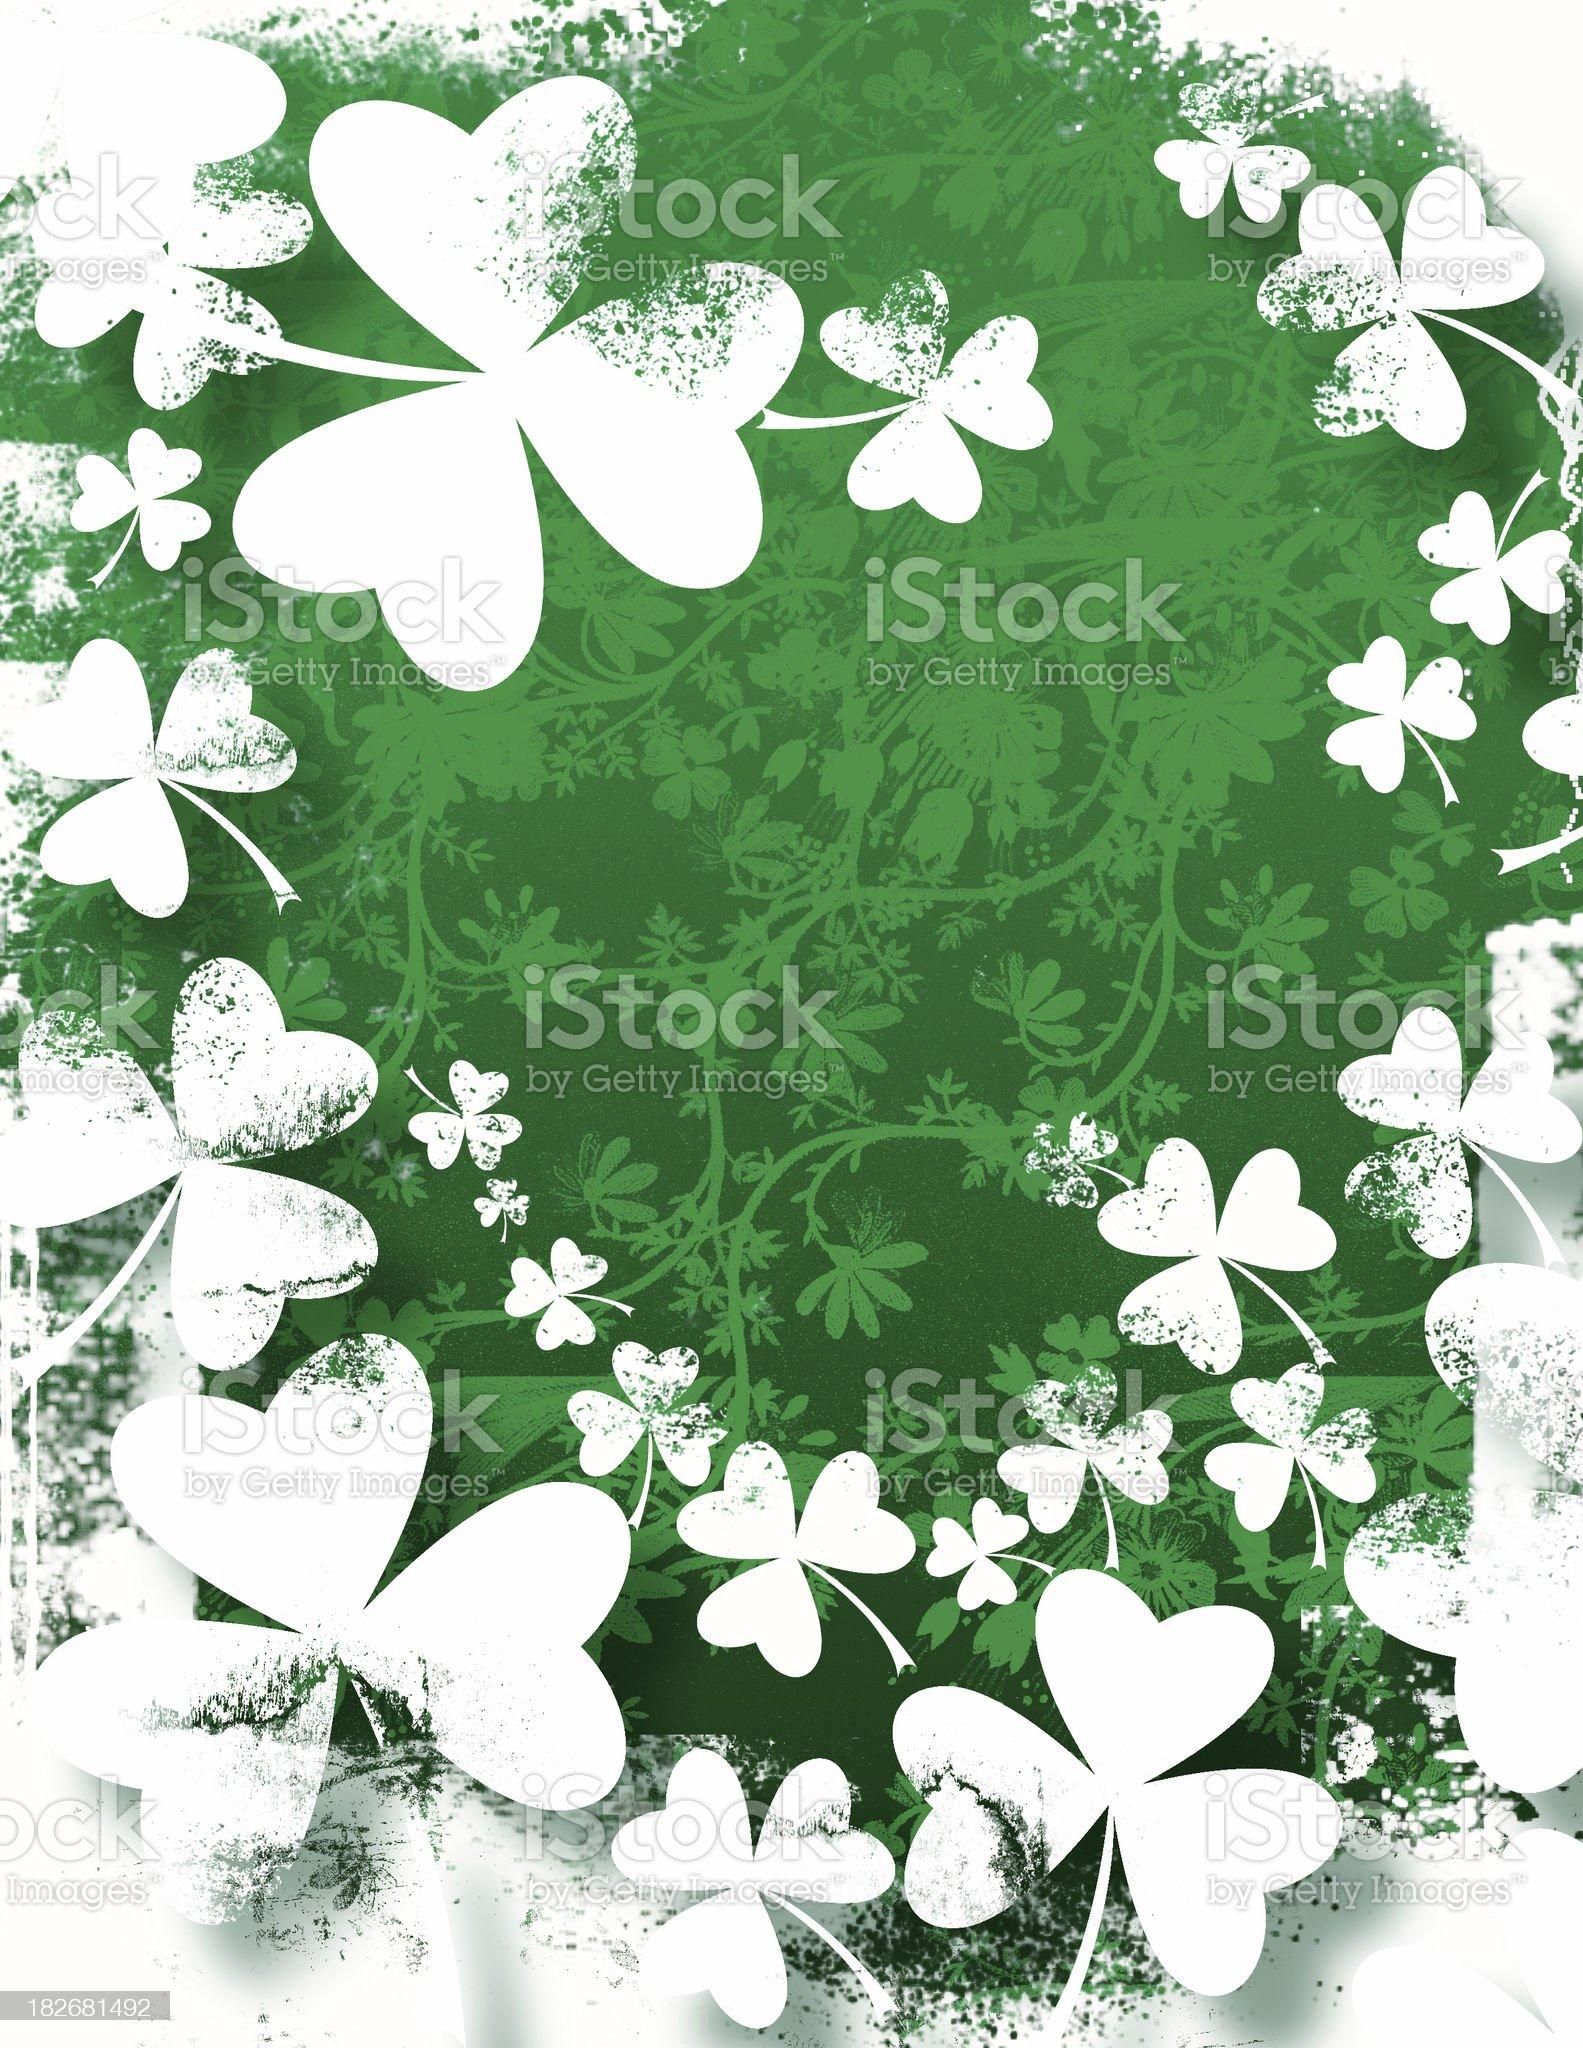 St. Patricks Background royalty-free stock photo